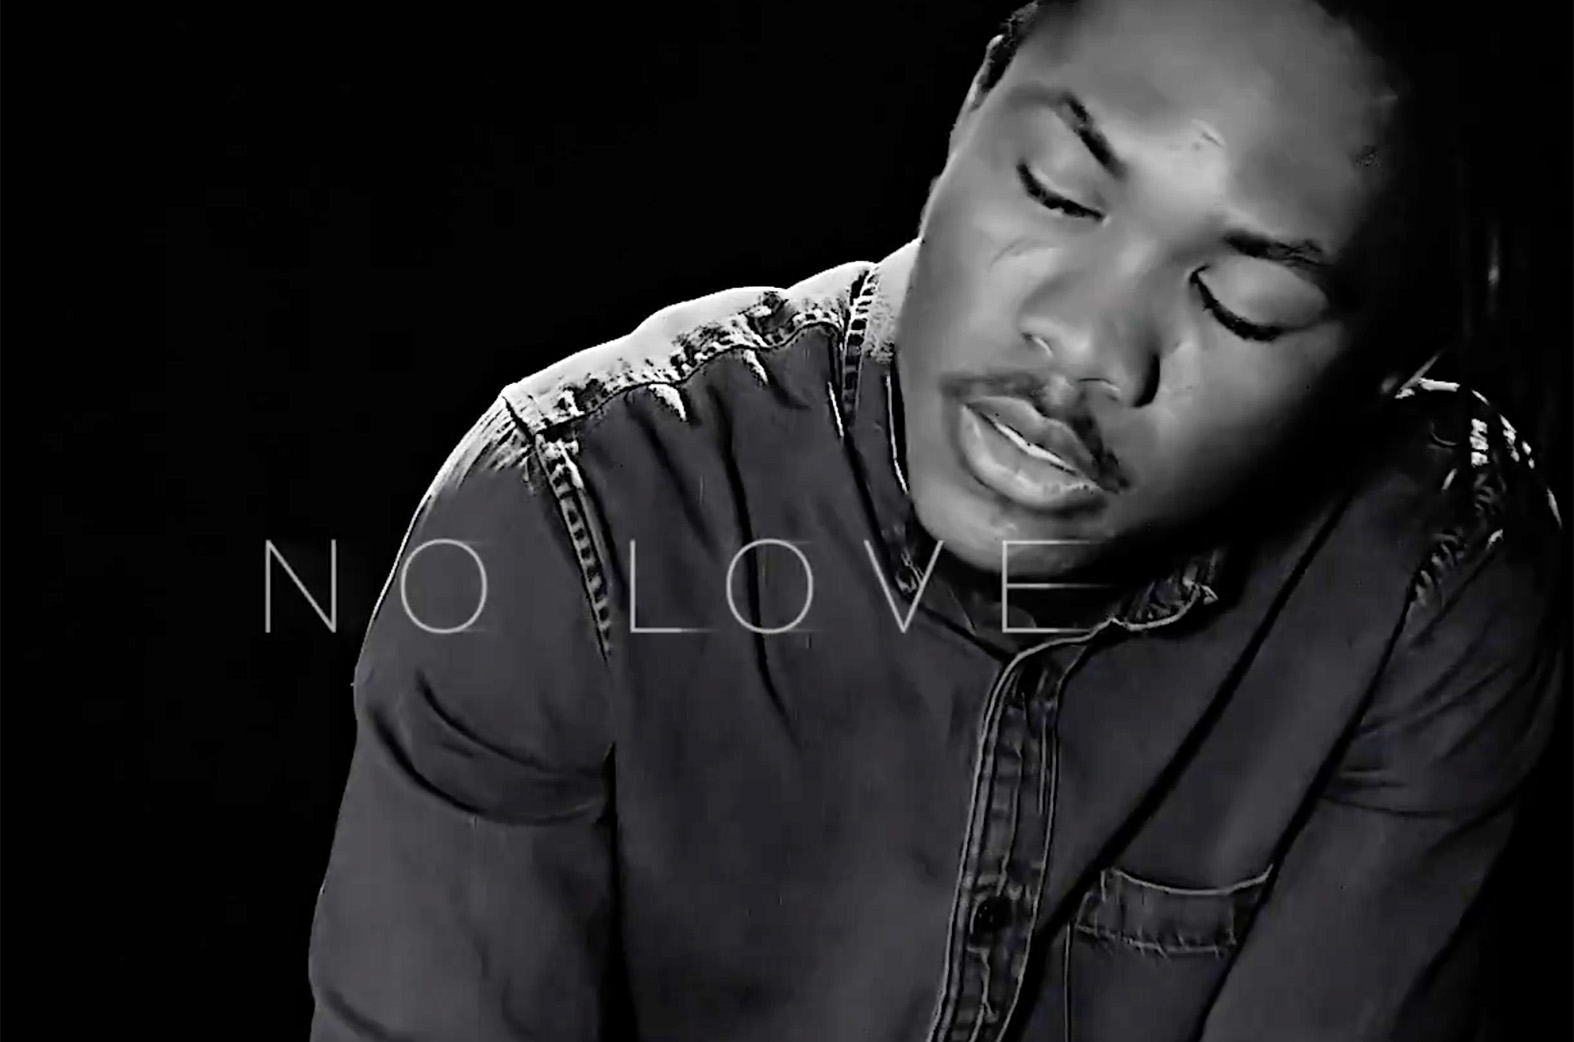 No Love (Attitude Riddim) by Frank Guy